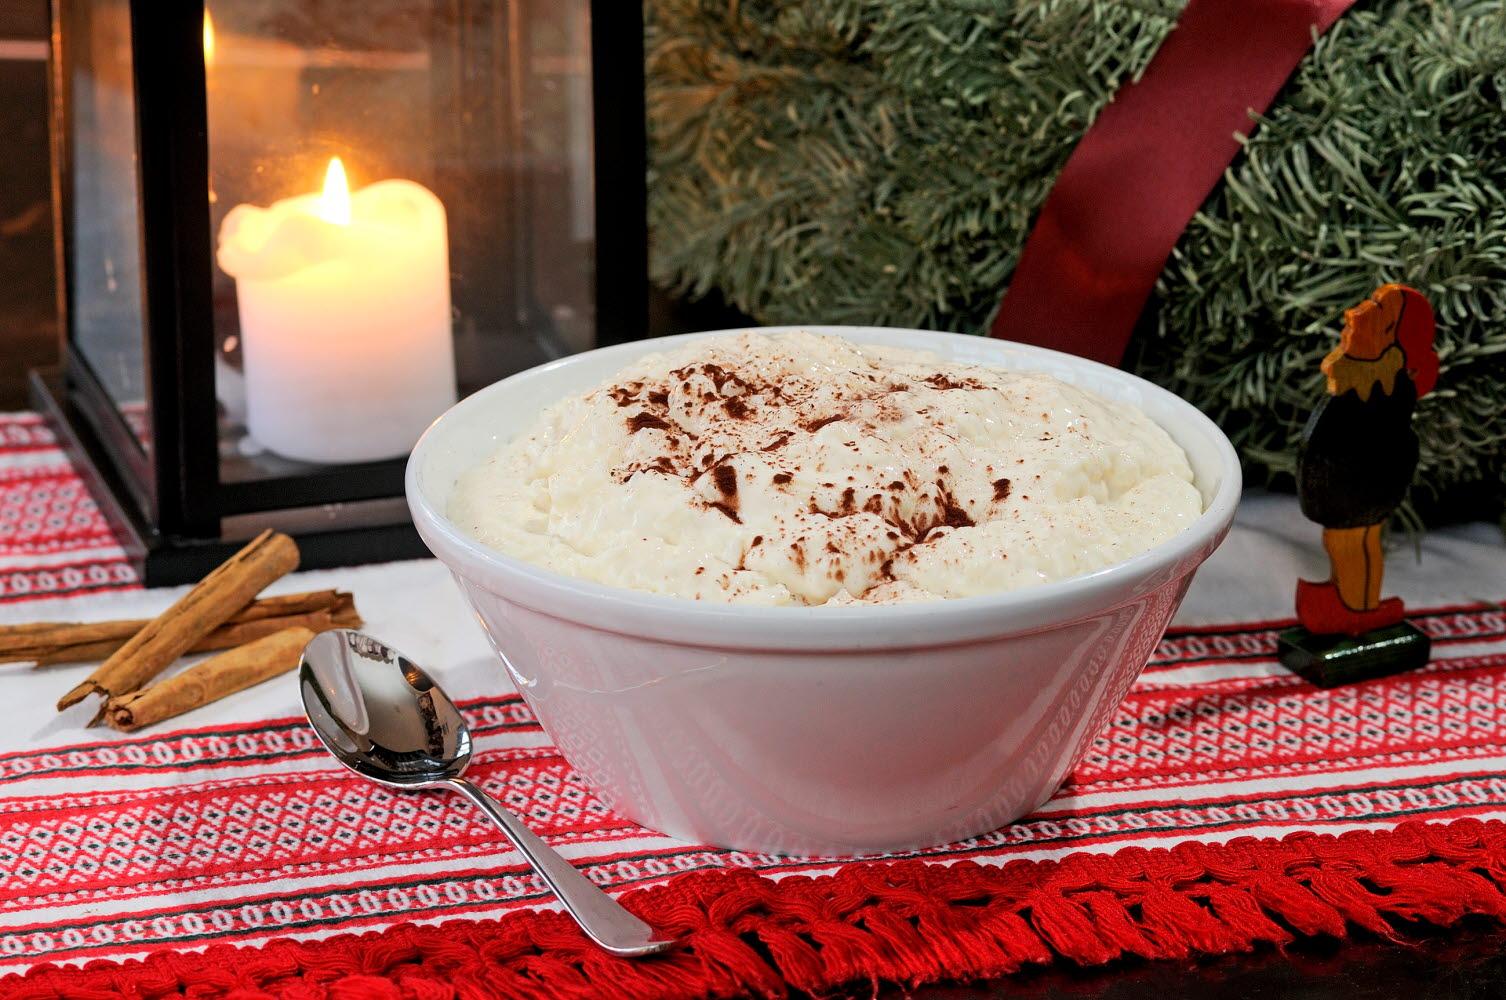 Christmas porridge at a Christmas dinner - Photo Cred Göran Assner